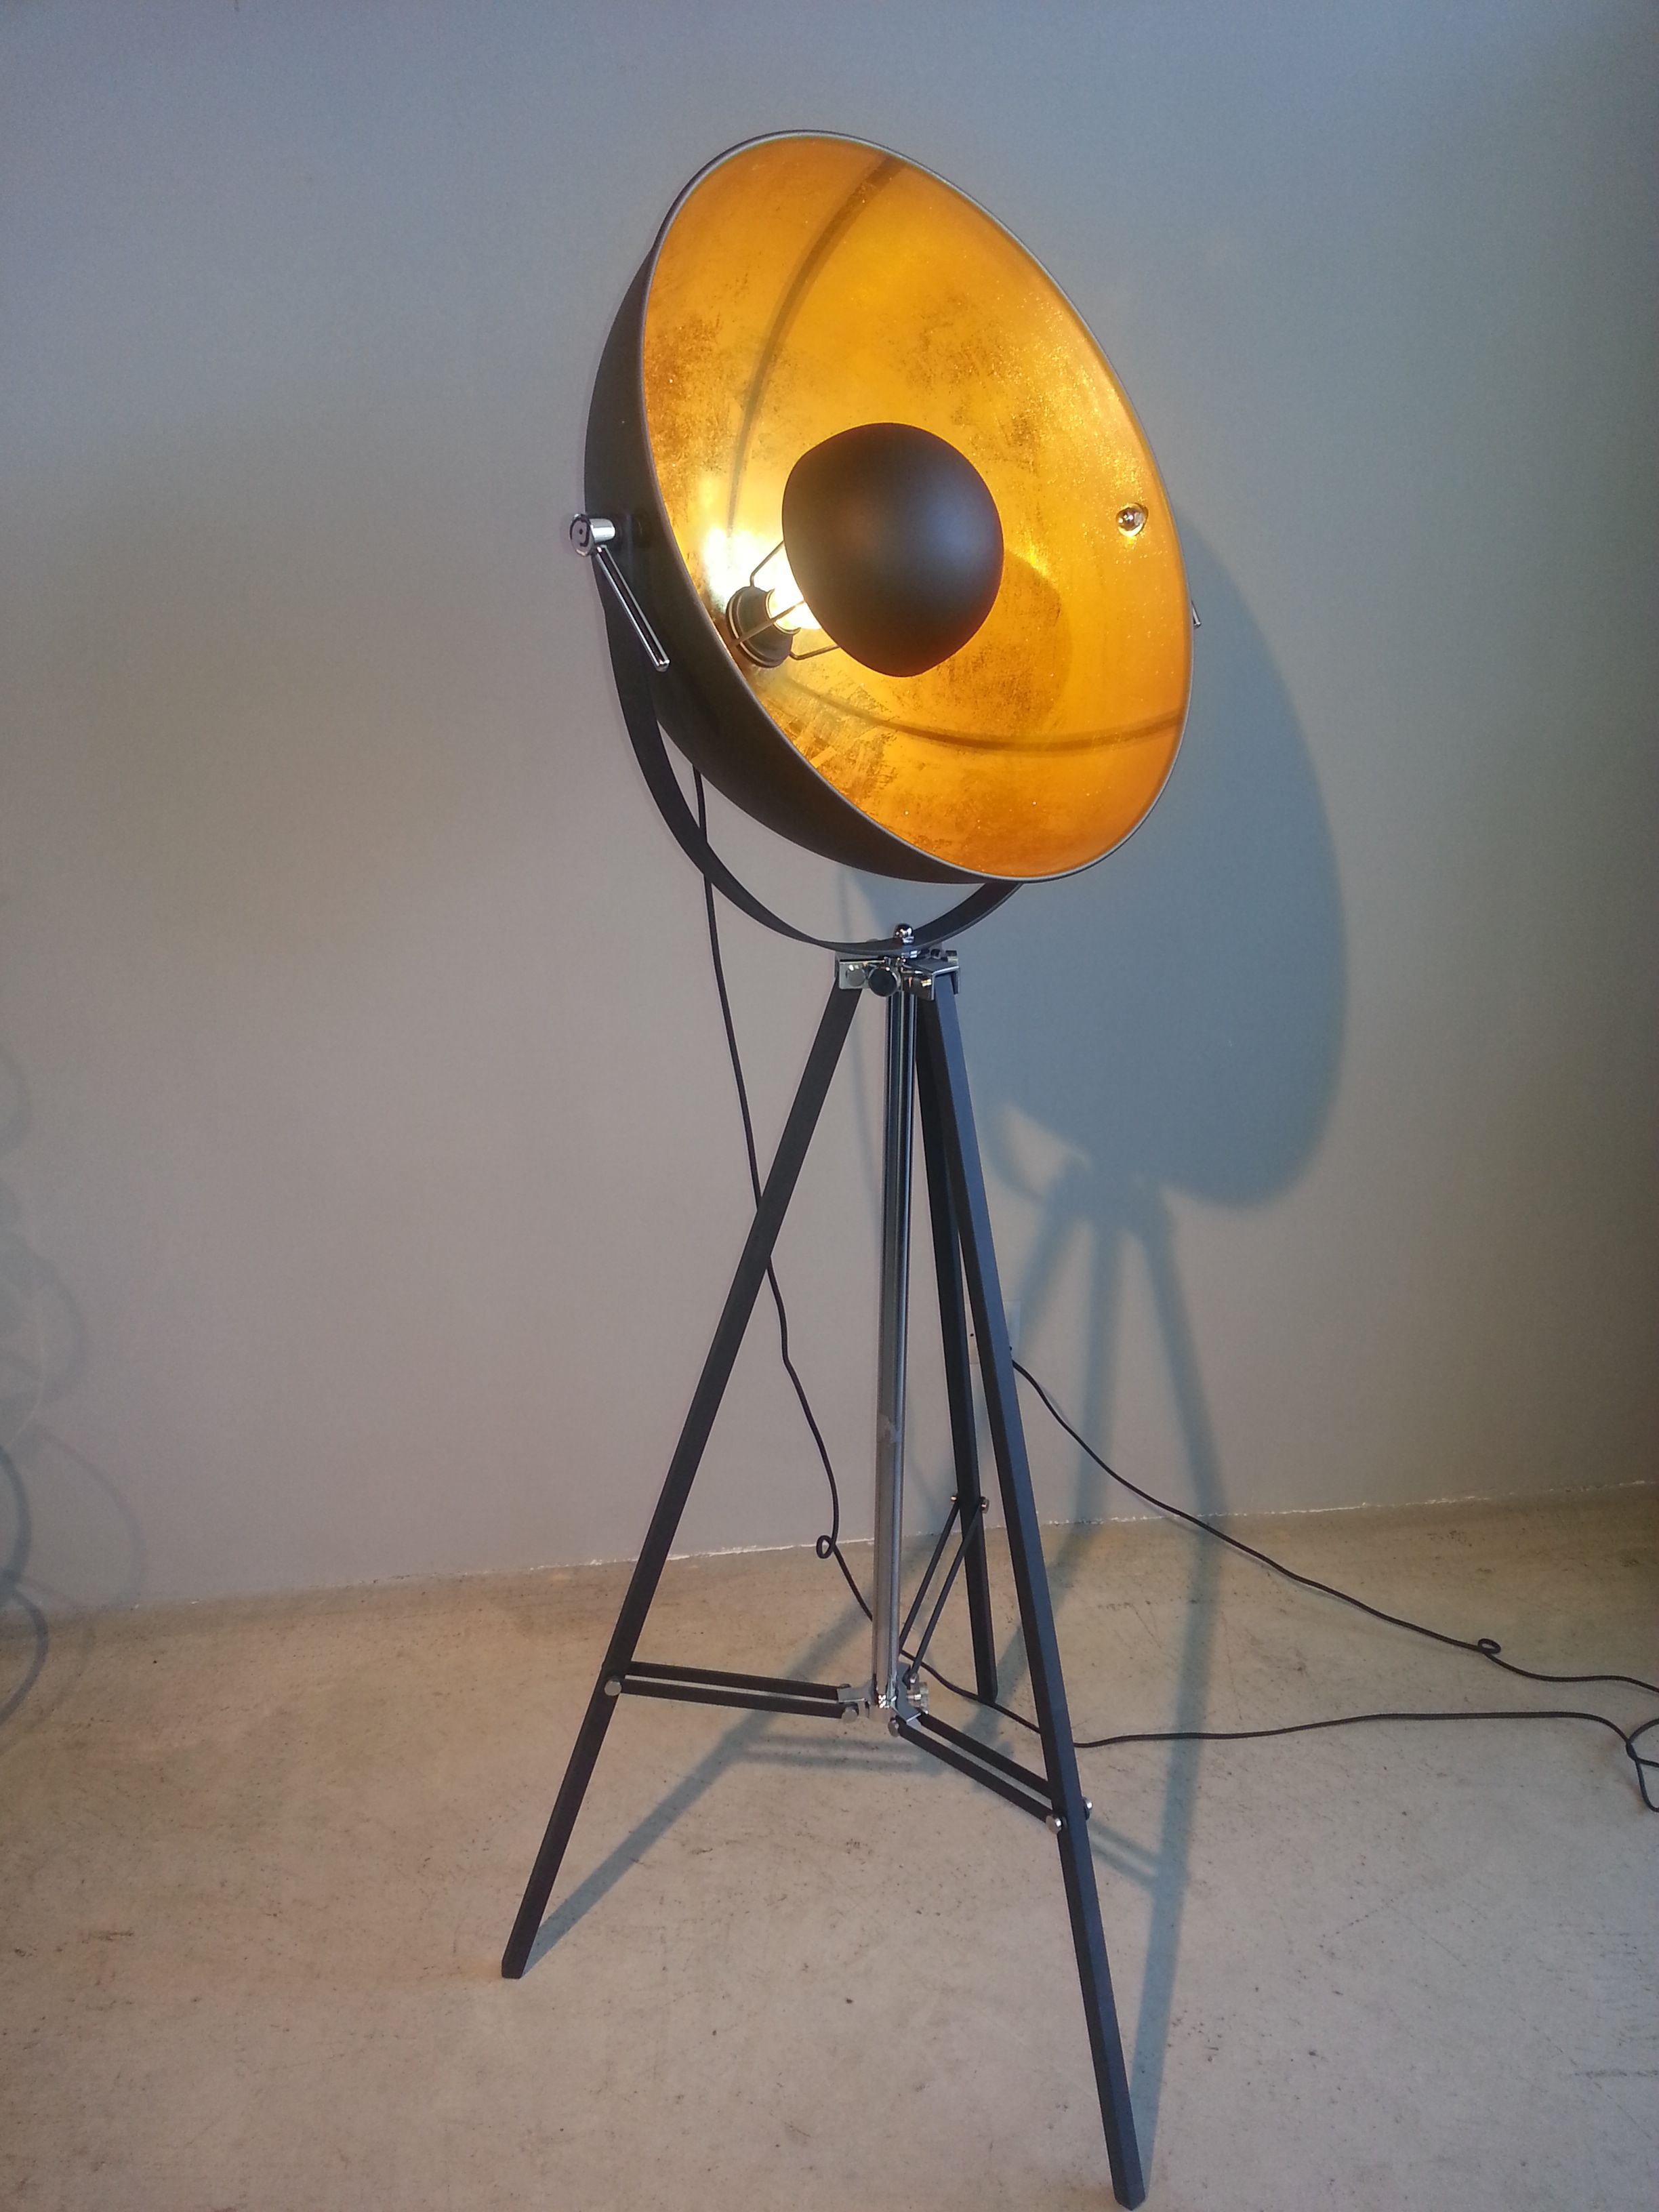 7956186a673414aa9b823de6998eb1c6 Faszinierend Stehlampe Studio Schwarz Gold Dekorationen